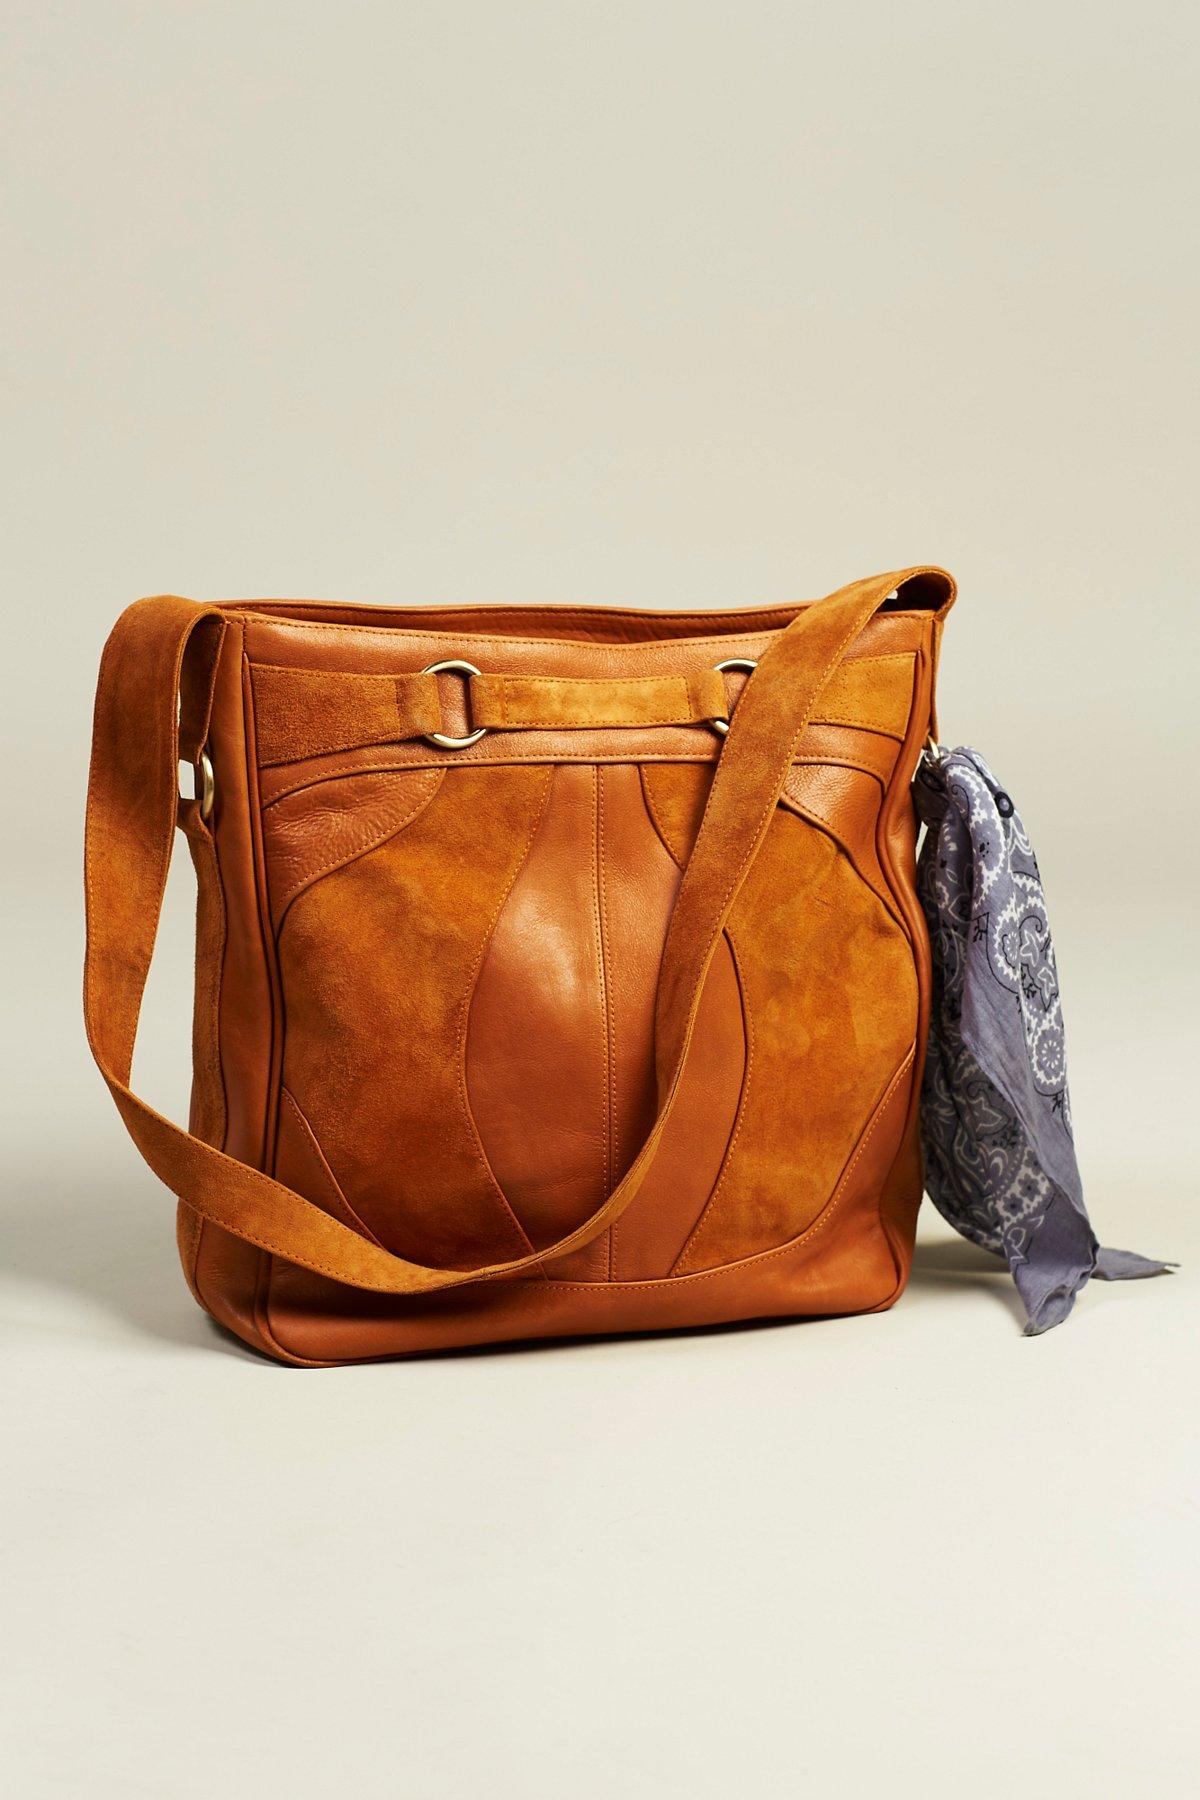 Copenhagen Leather Tote